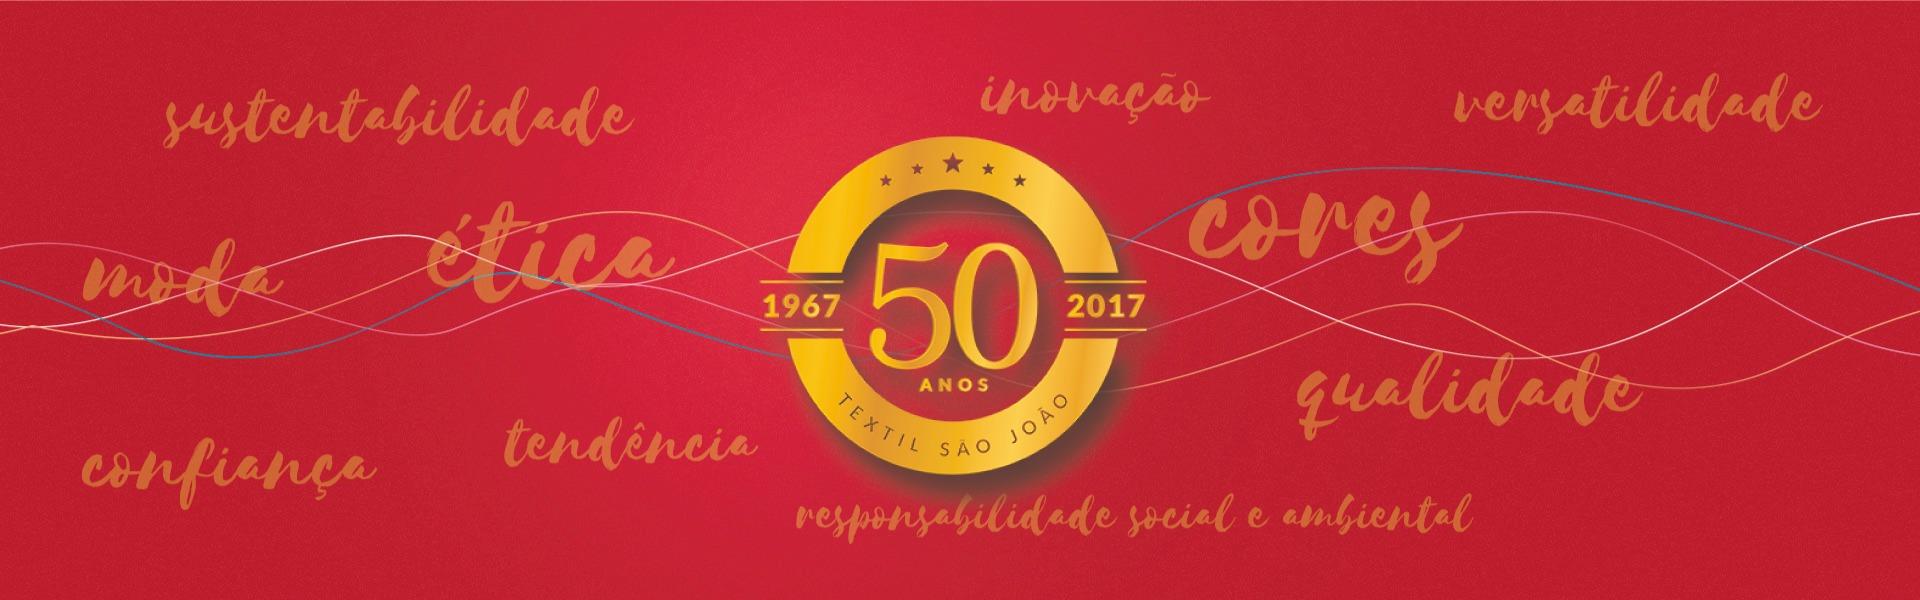 Slide cinquenta anos